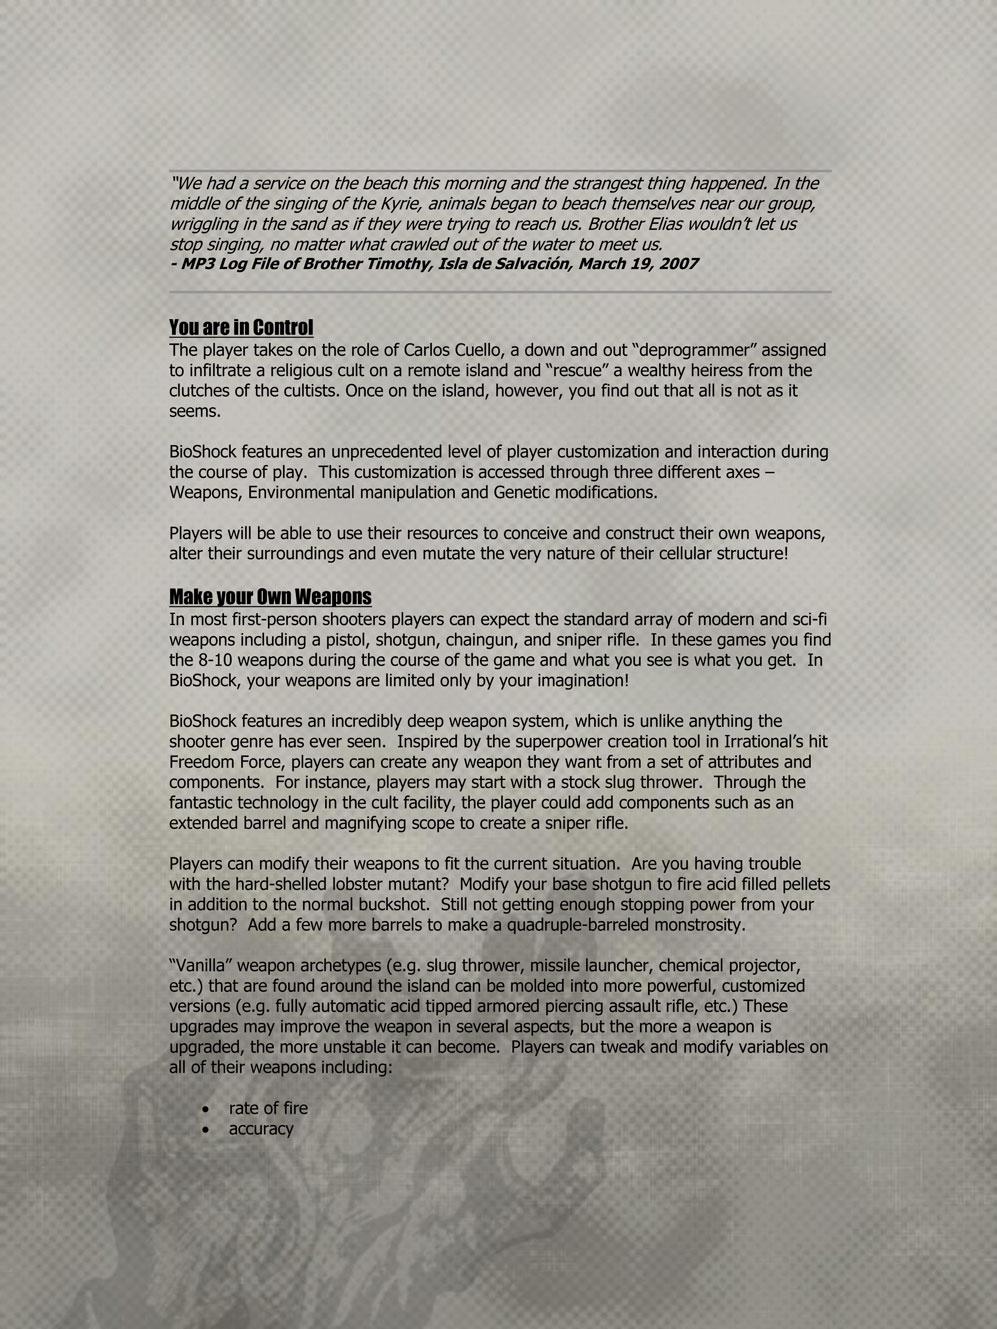 BioShock DesignDoc div006